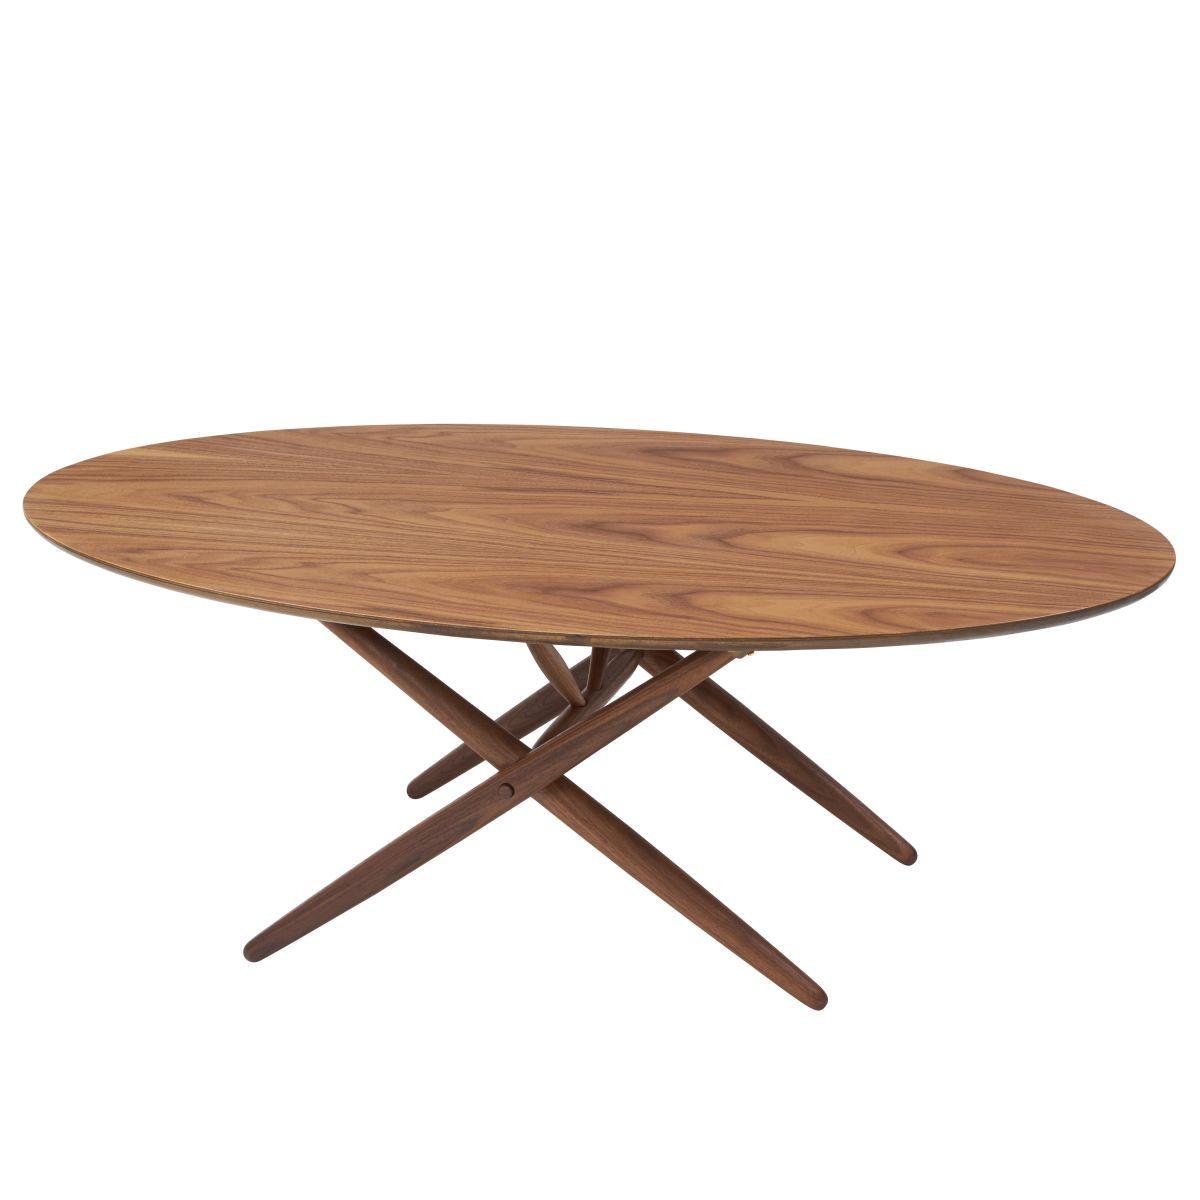 Ovalette-Table-walnut-2627426